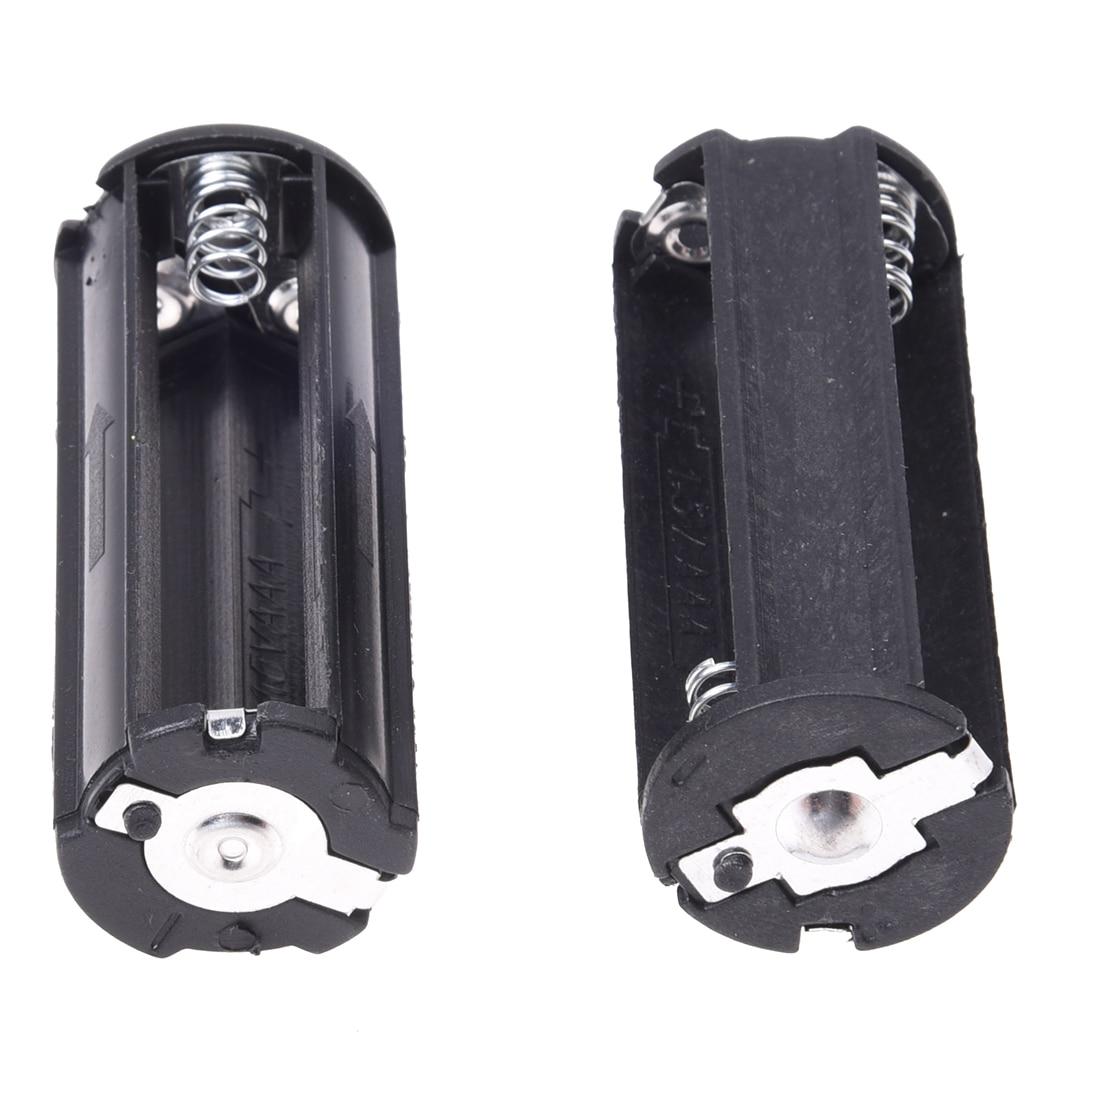 2Pcs Black Battery Holder for 3 x 1.5V AAA Batteries Flashlight Torch